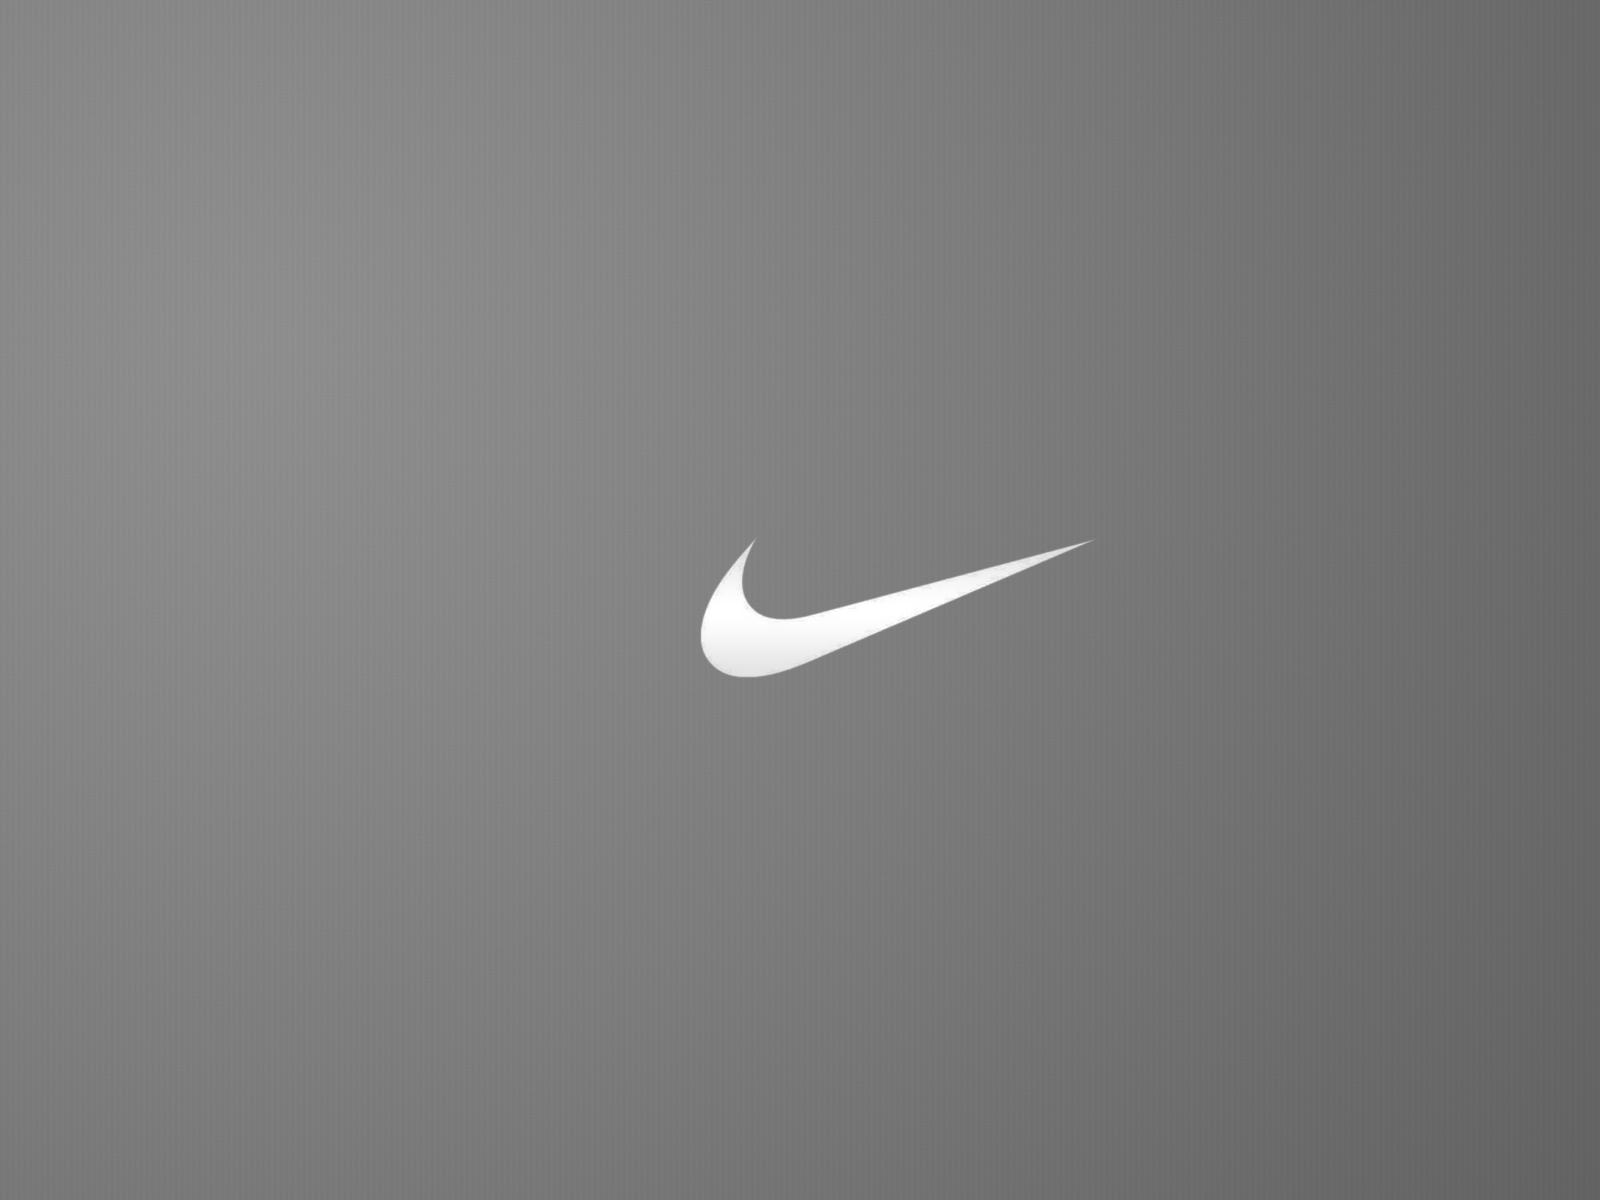 Wonderful   Wallpaper Home Screen Nike - Nike_Logo_Greyscale_Minimal_HD_Wallpaper-Vvallpaper  2018_26964.jpg